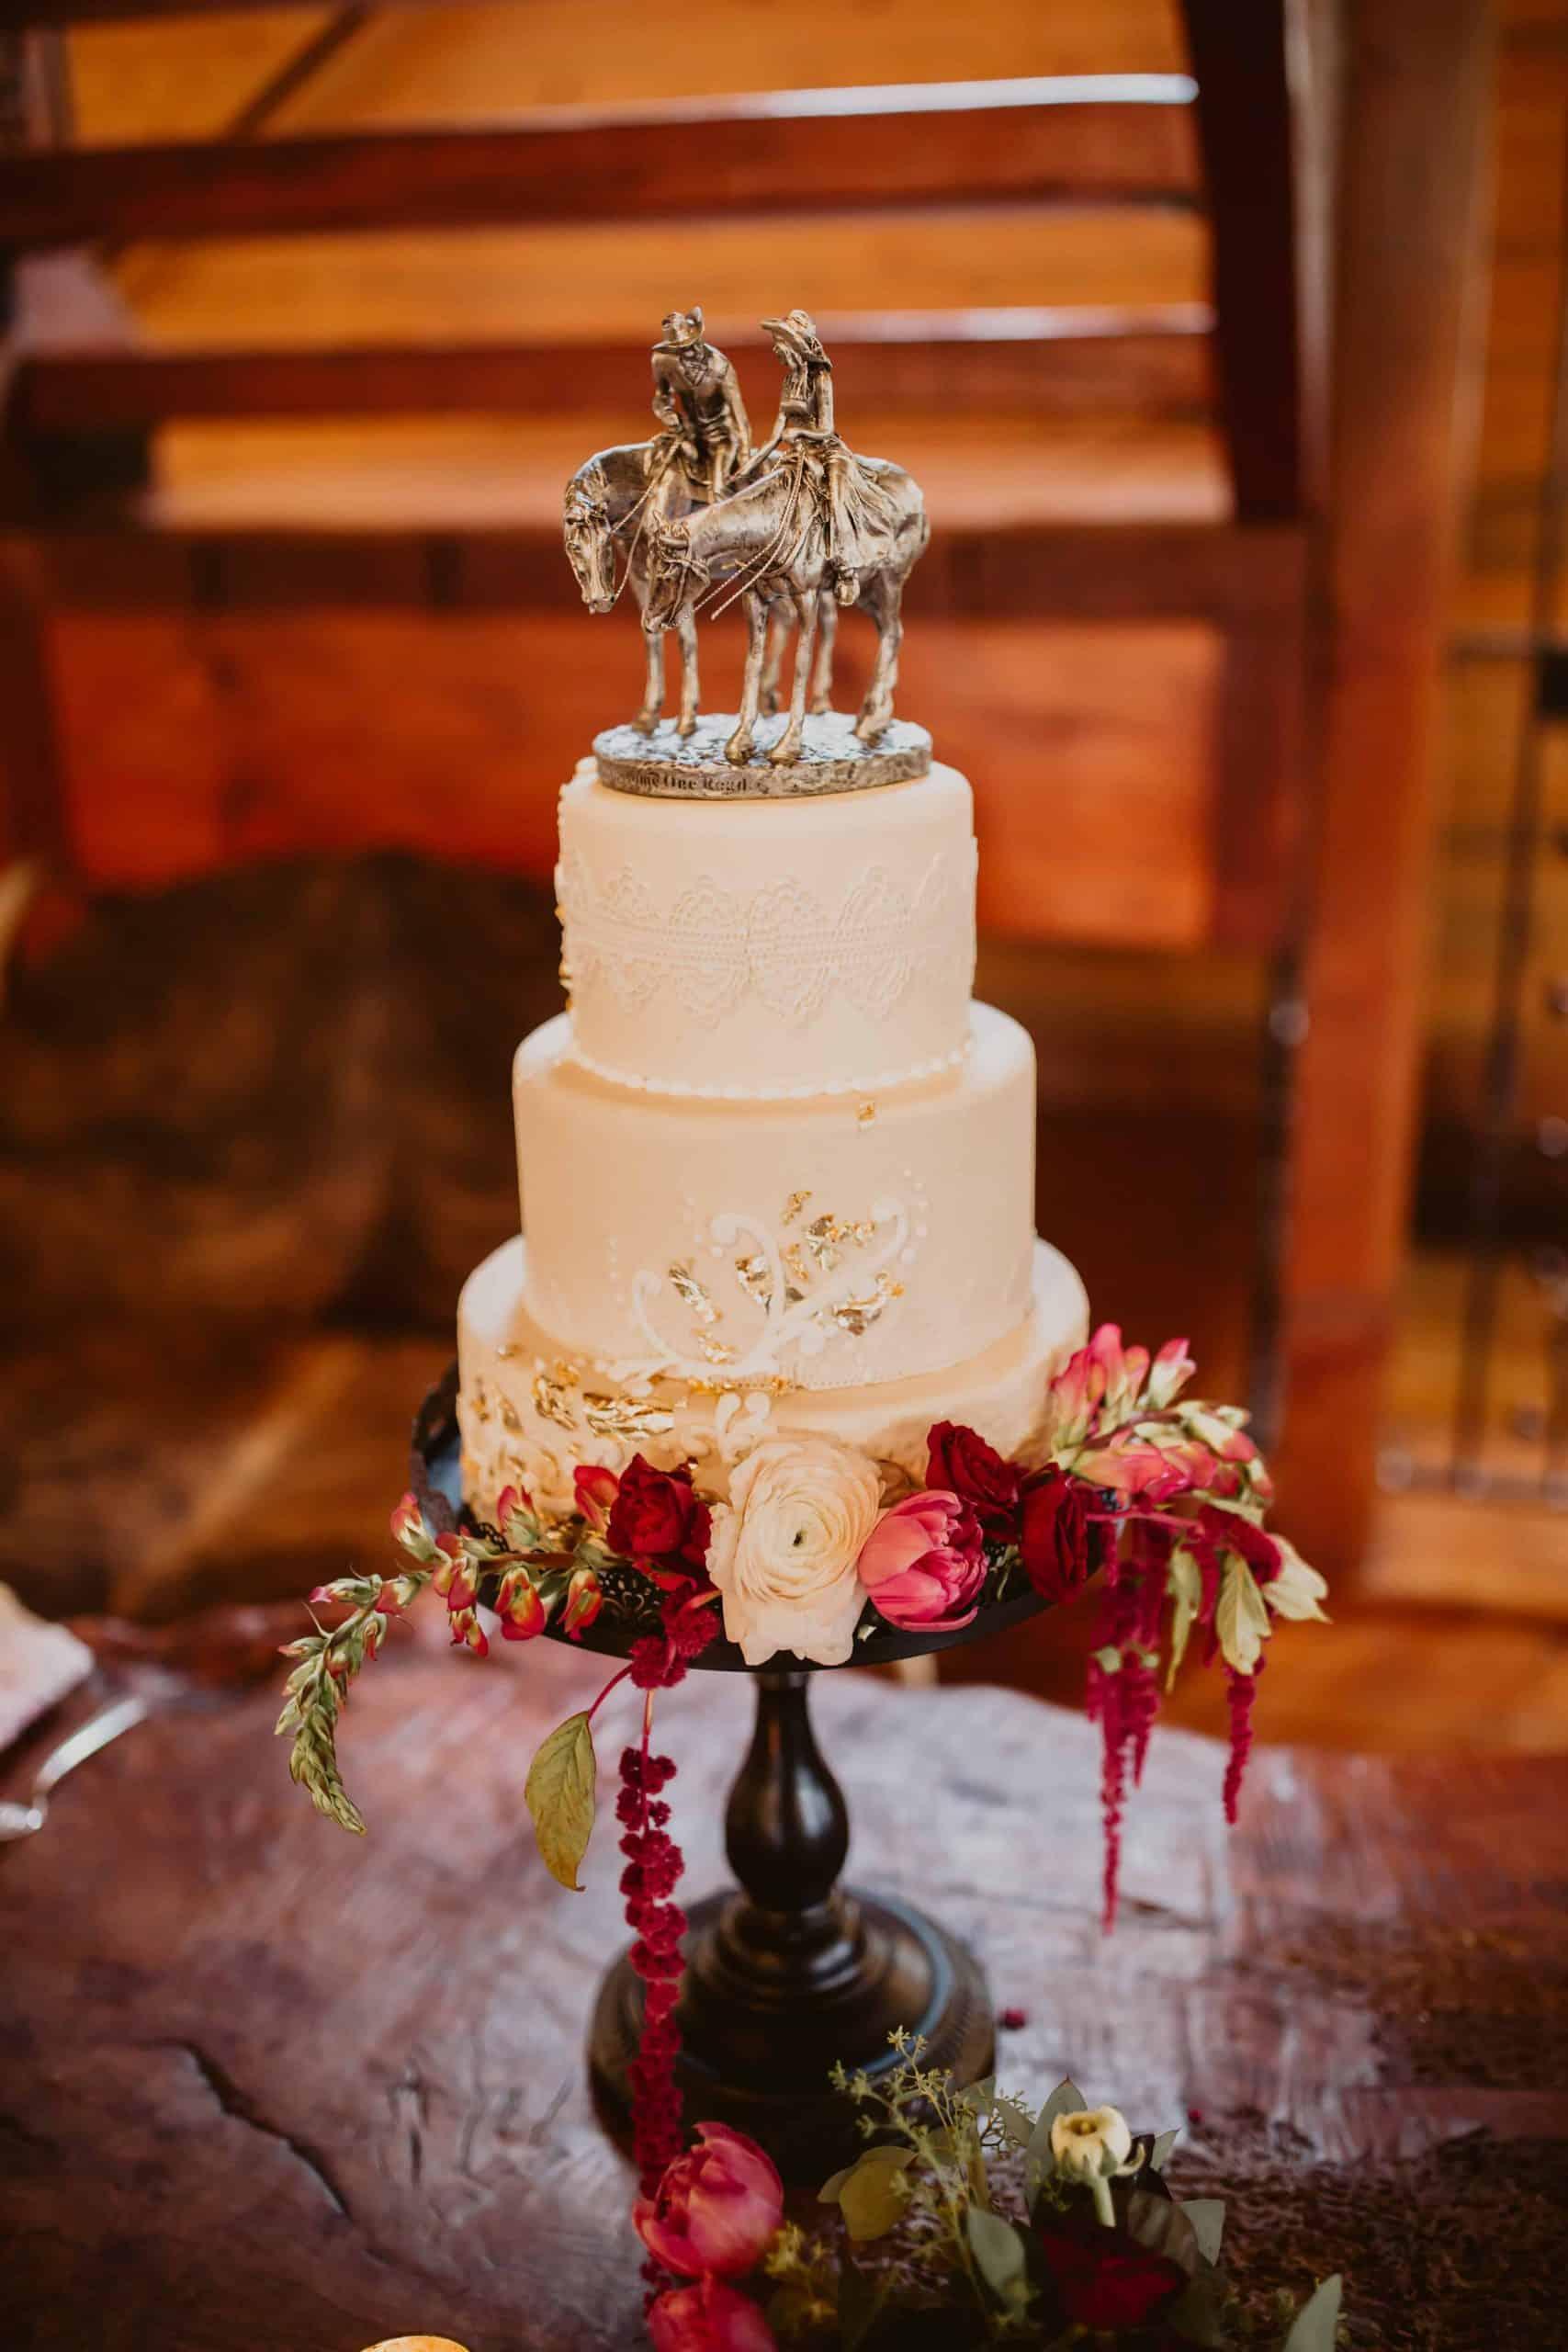 The Makery Cake Company Western Theme Wedding Cake